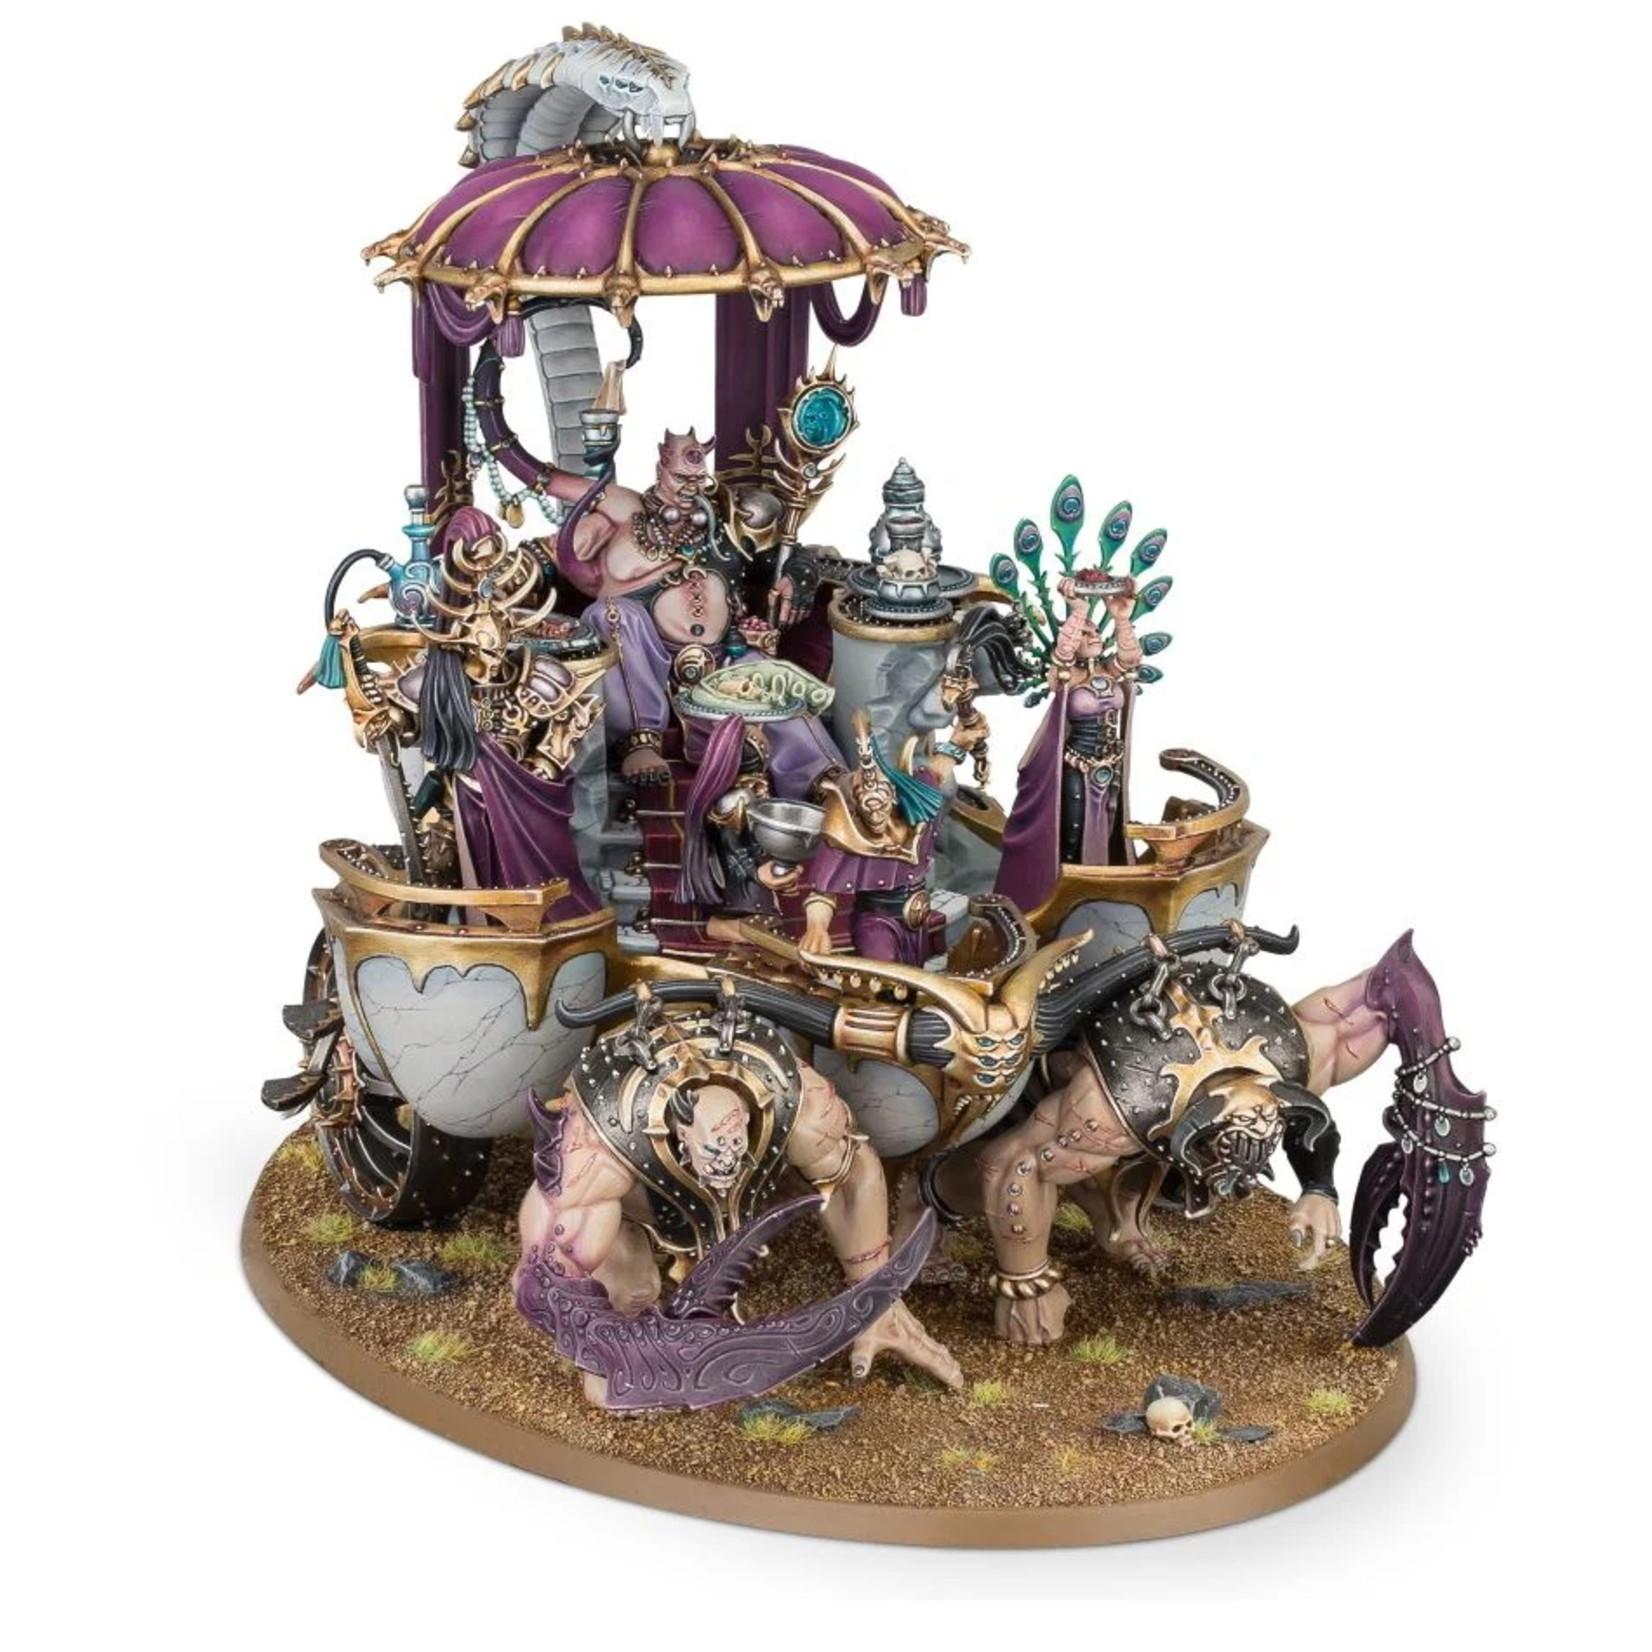 Games Workshop Glutos Orscollion, Lord of Gluttony